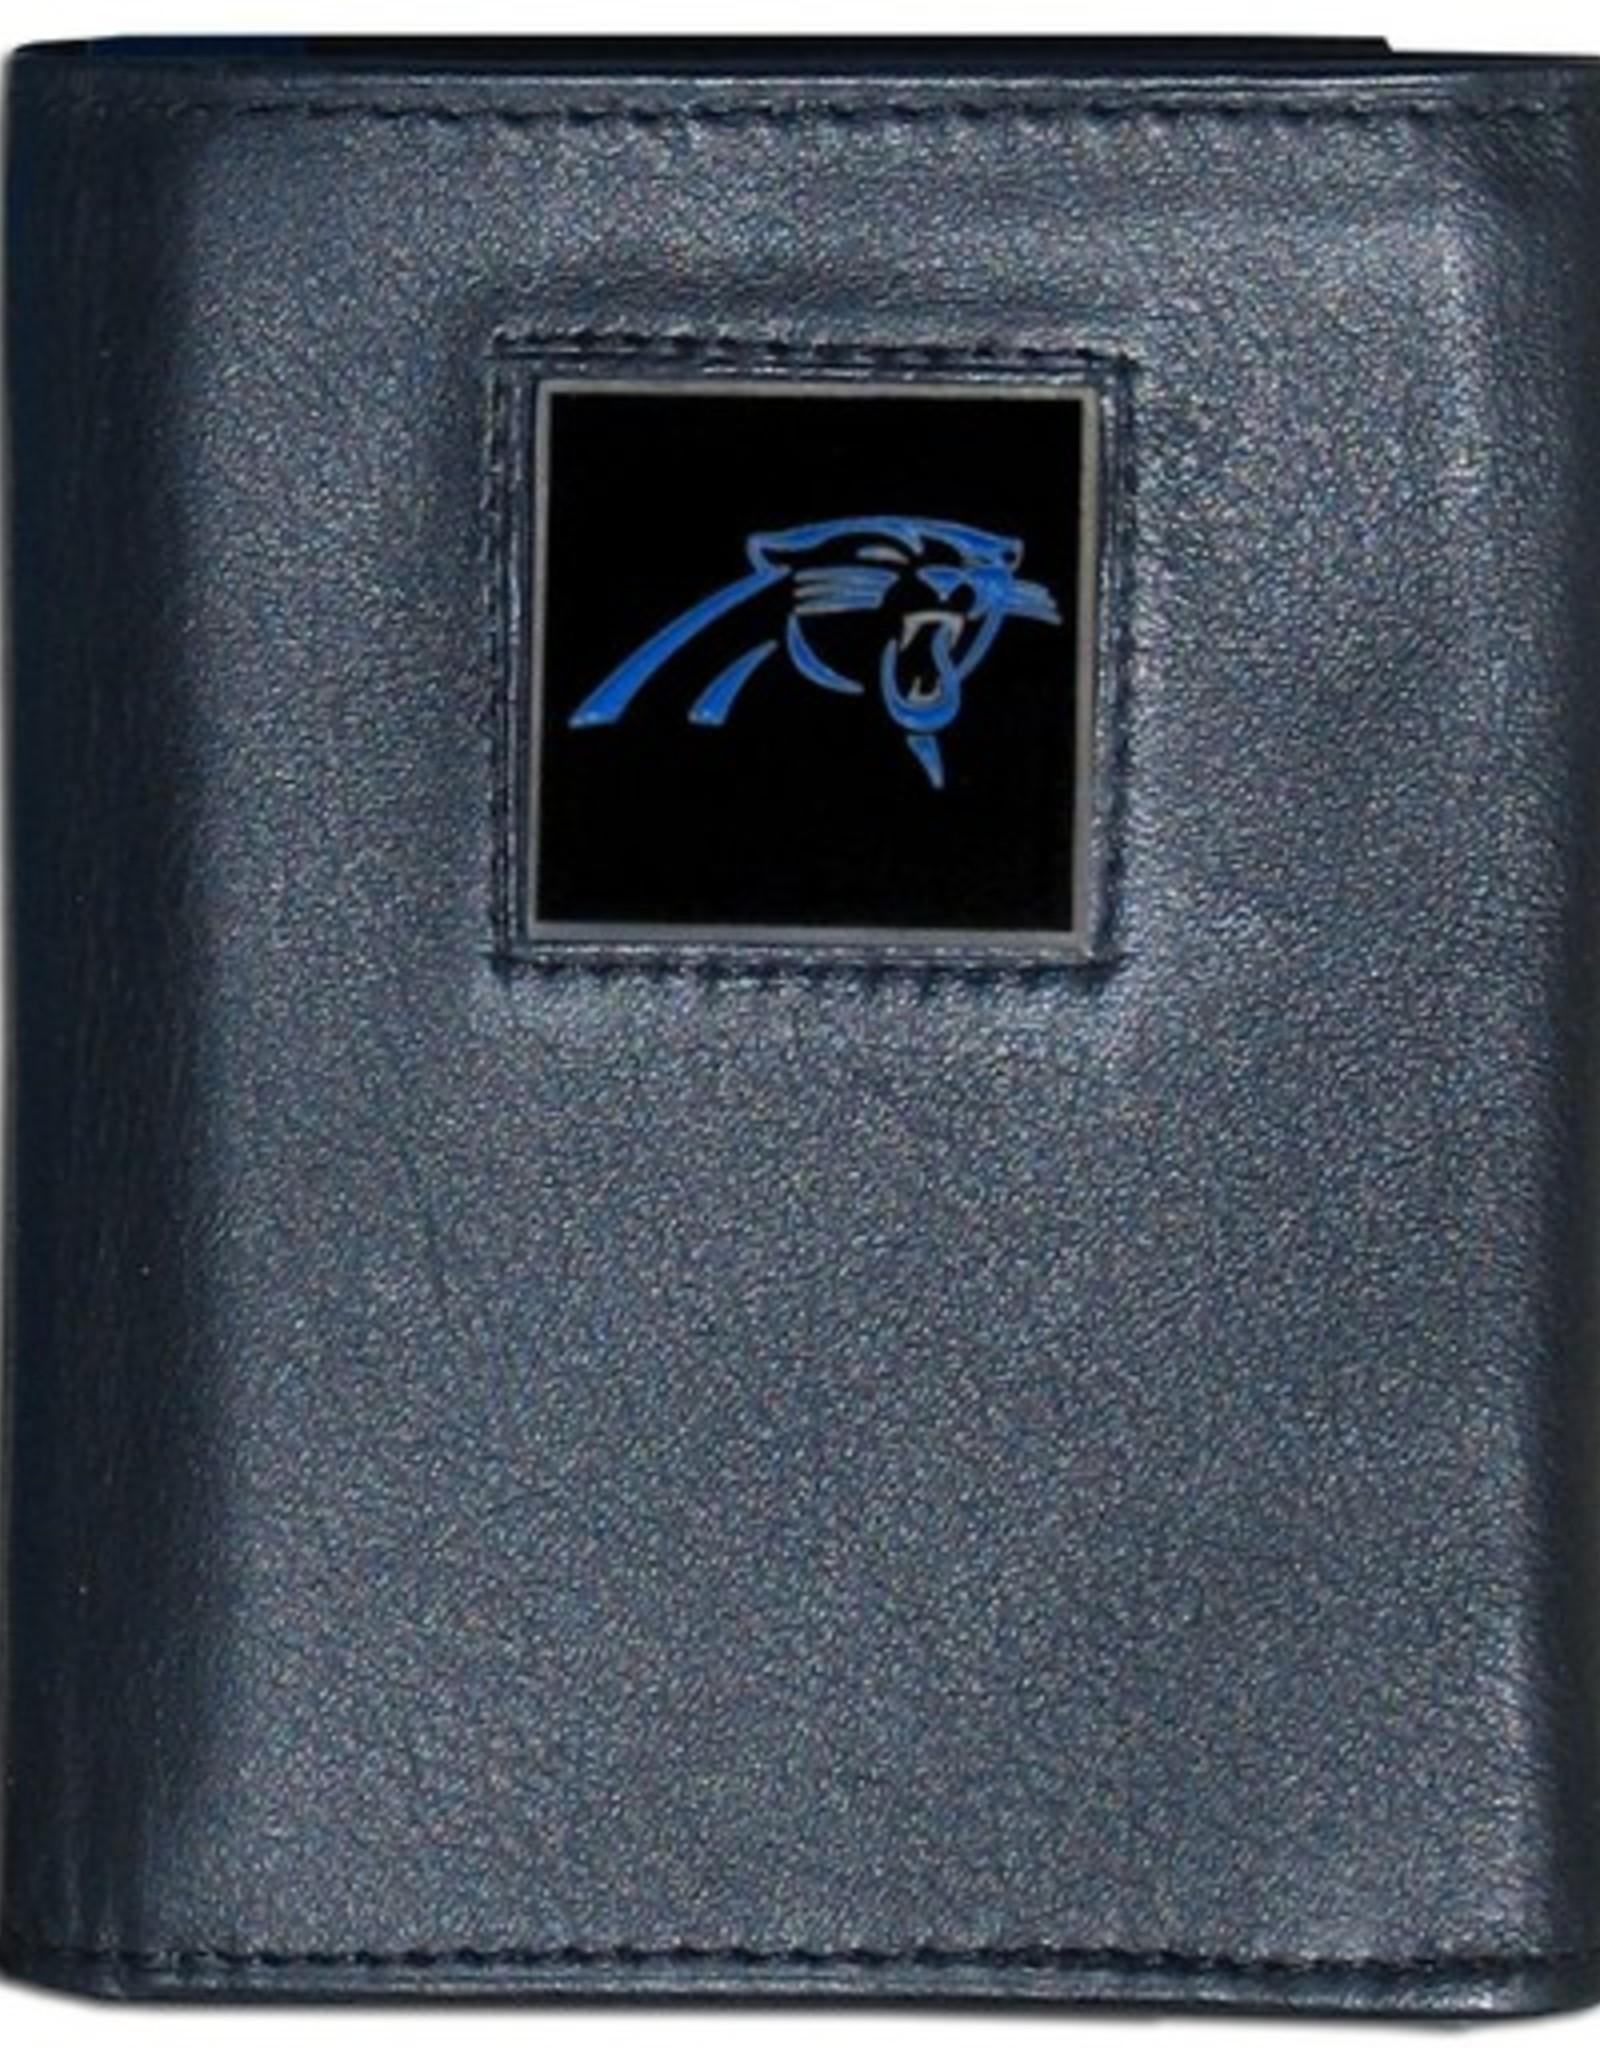 Carolina Panthers Executive Black Leather Trifold Wallet